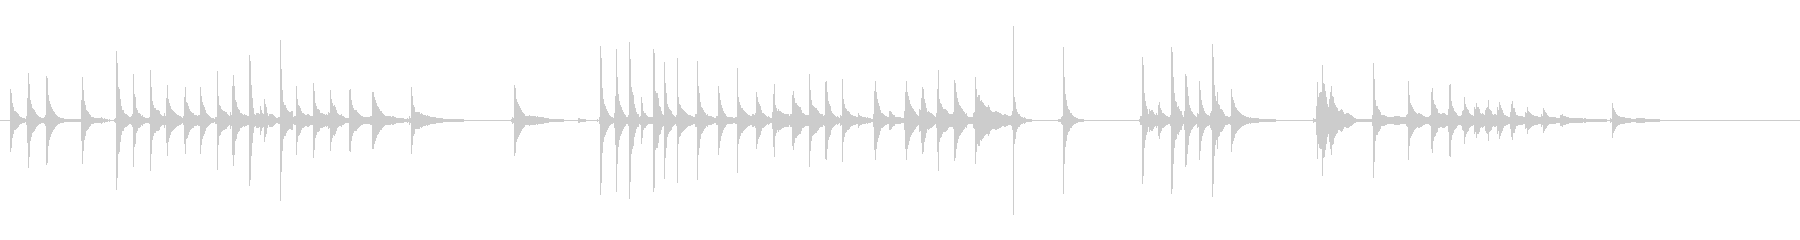 三味線112連獅子5峰を歌舞伎生音和風親の未再生の波形